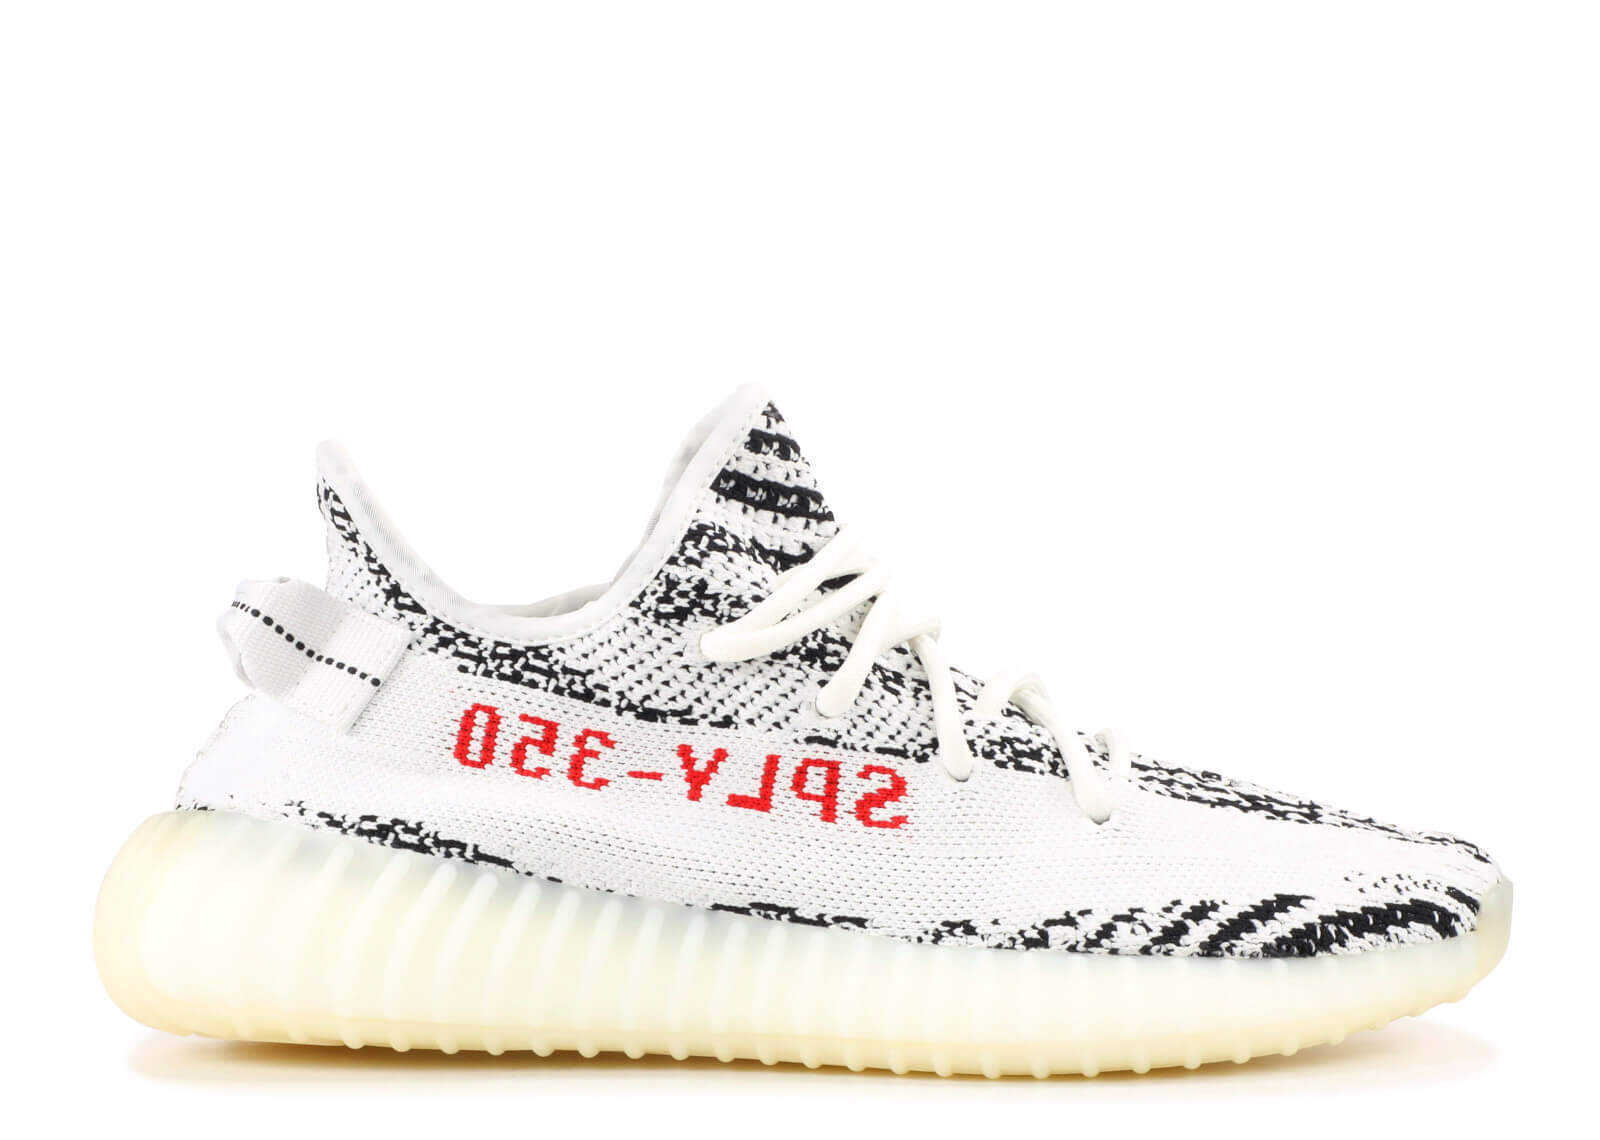 adidas Yeezy Boost 350 V2 CP9654 Zebra – ARCH-USA bbb82c17f